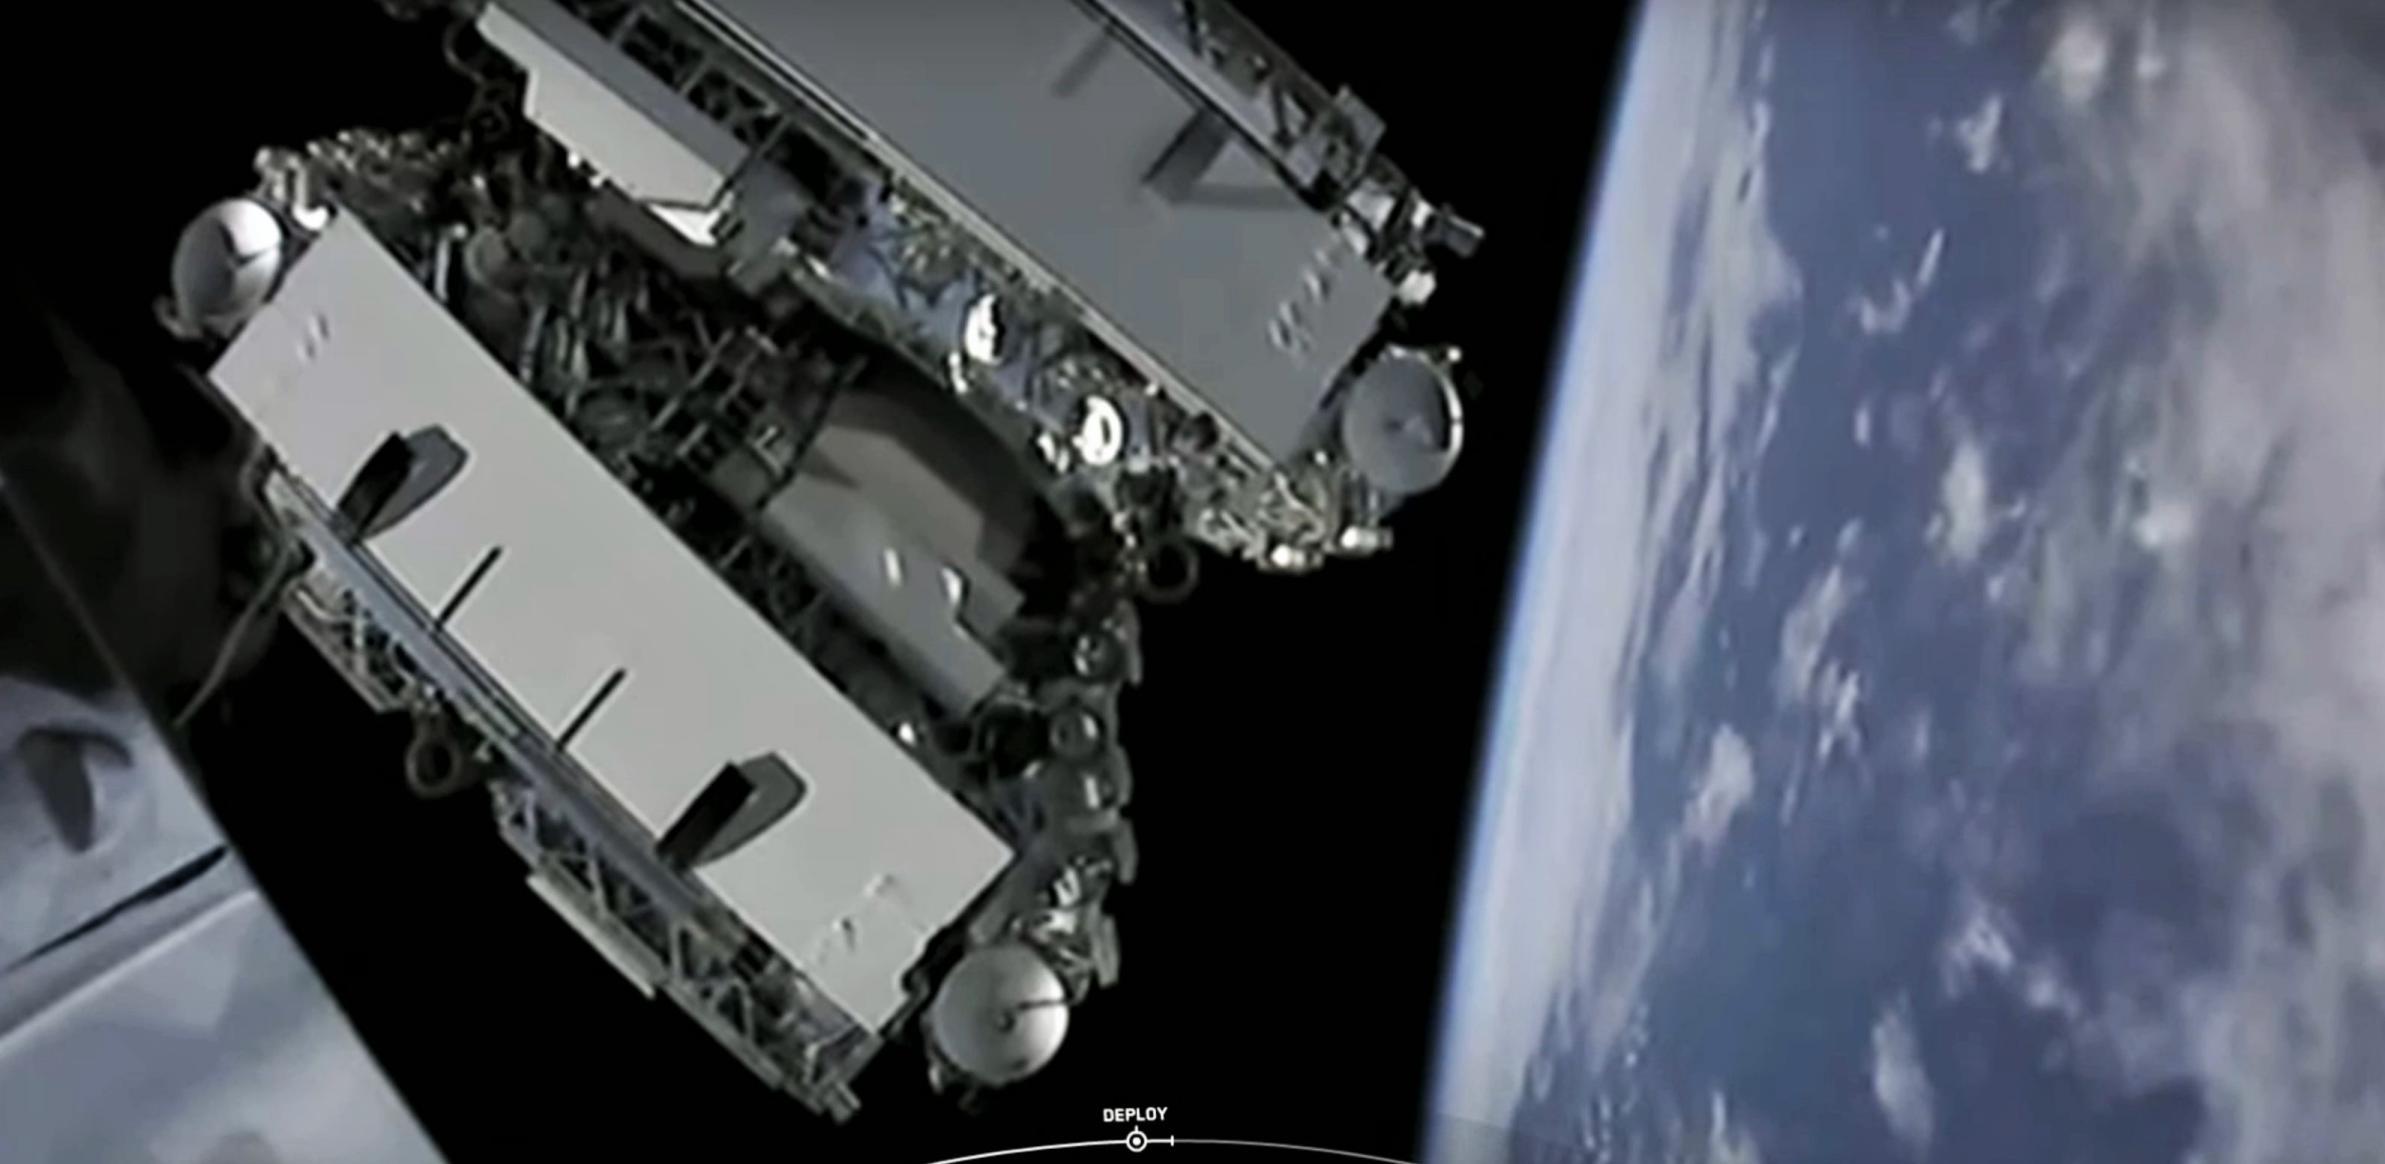 Starlink-2 Falcon 9 B1049 webcast (SpaceX) deployment 2 (c)